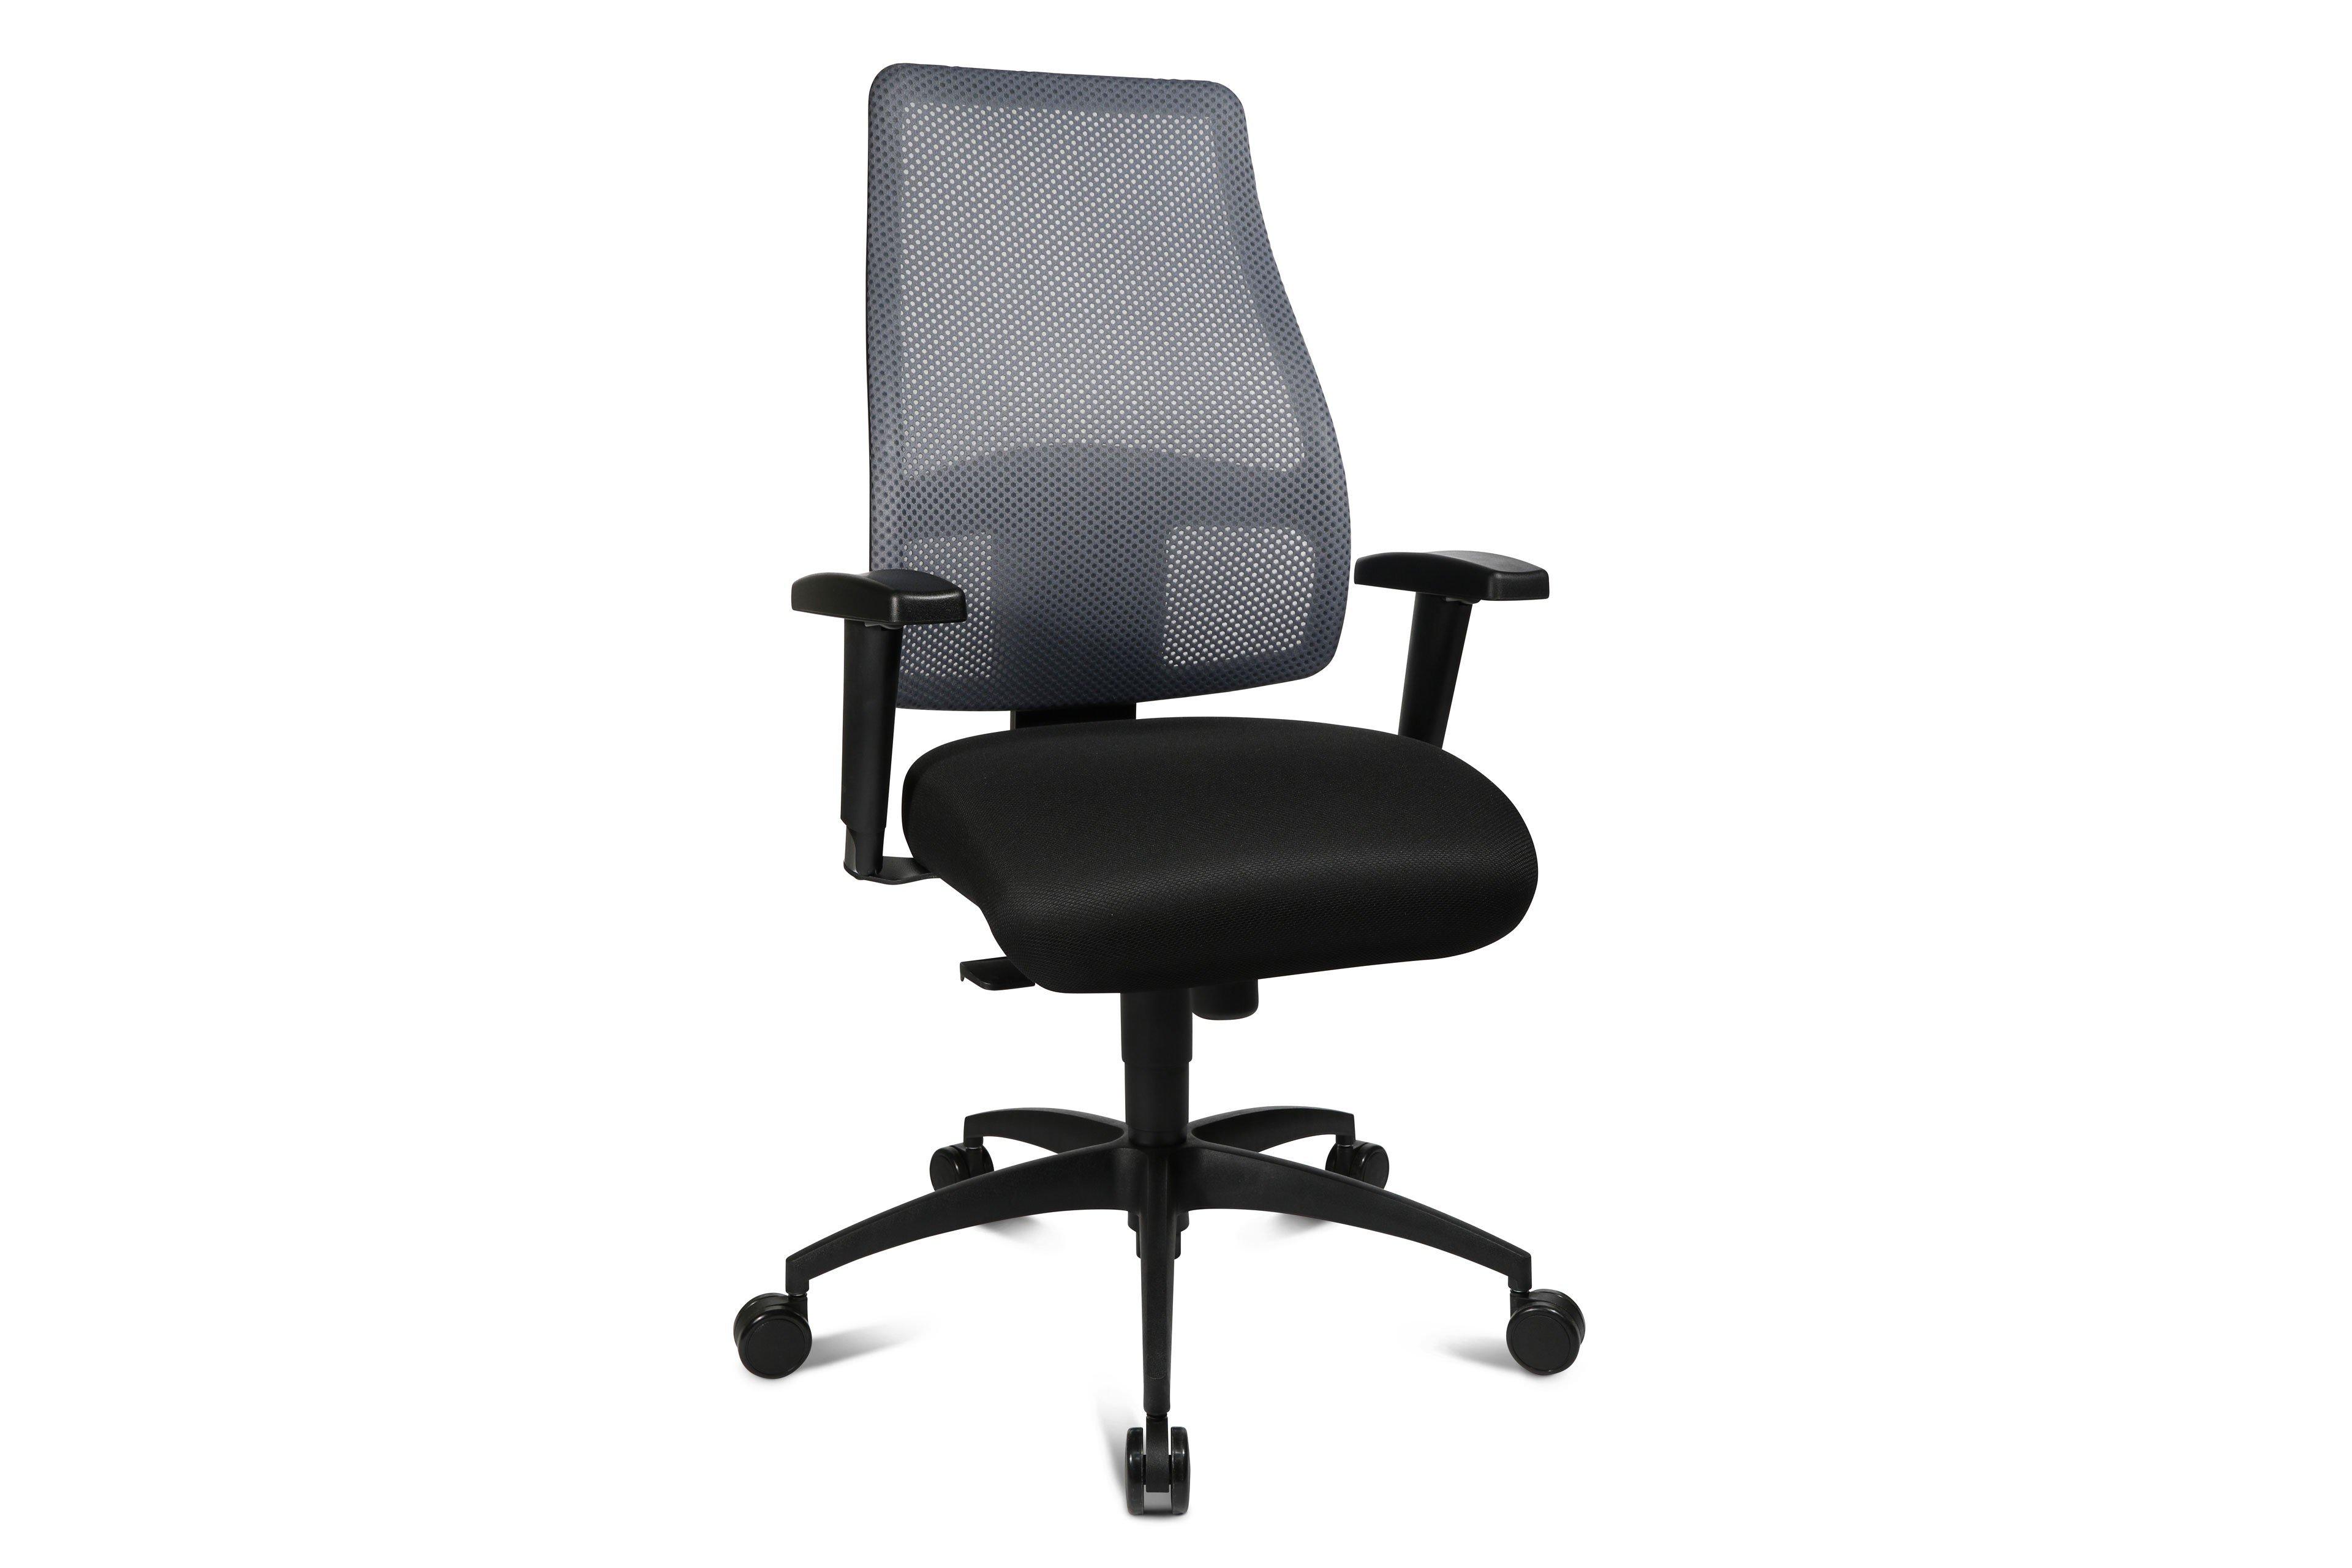 Topstar Drehstuhl Linea Comfort grau/ schwarz   Möbel Letz - Ihr ...